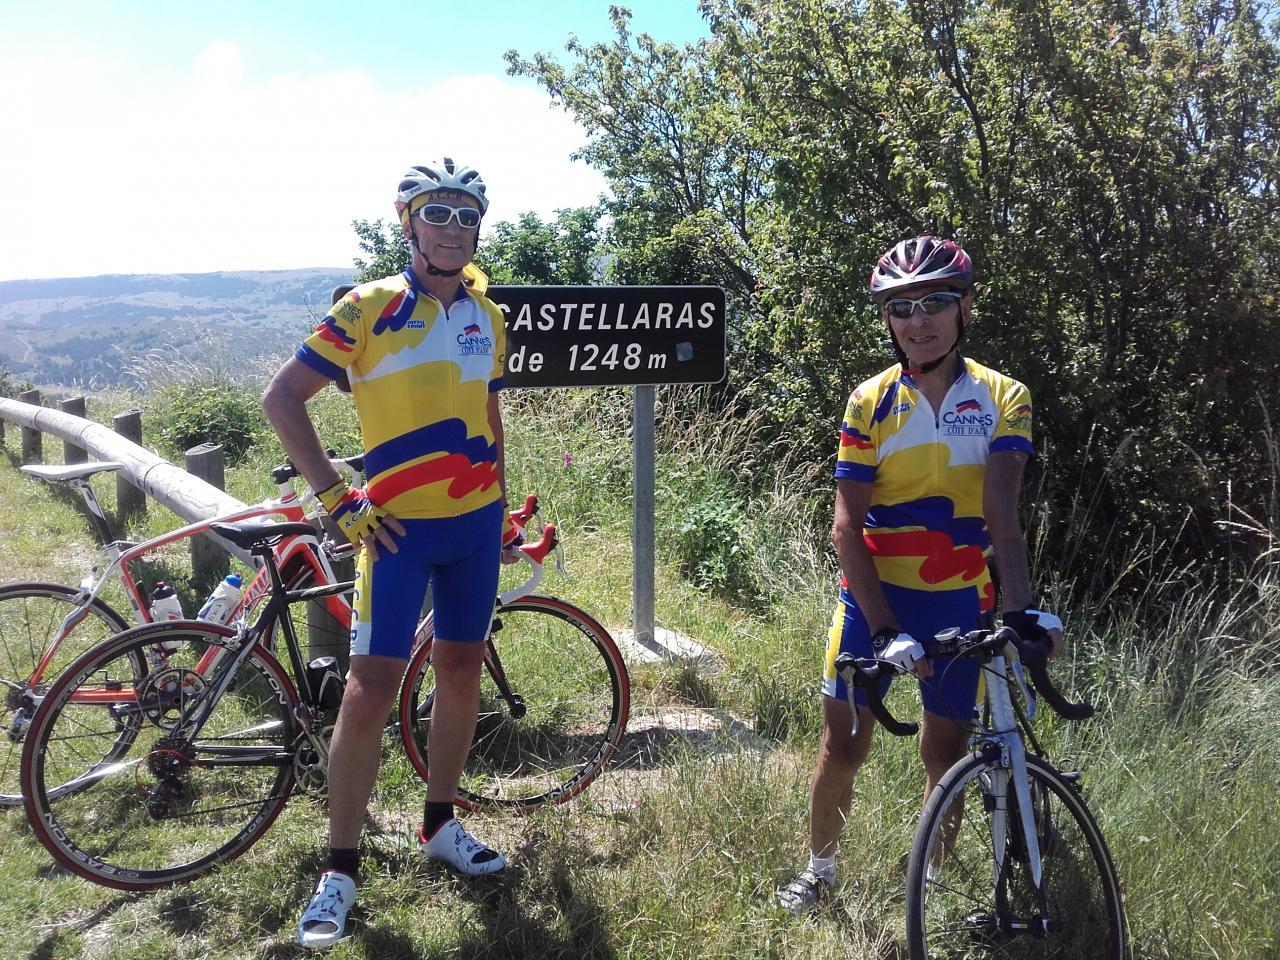 07/07 Le Castellaras